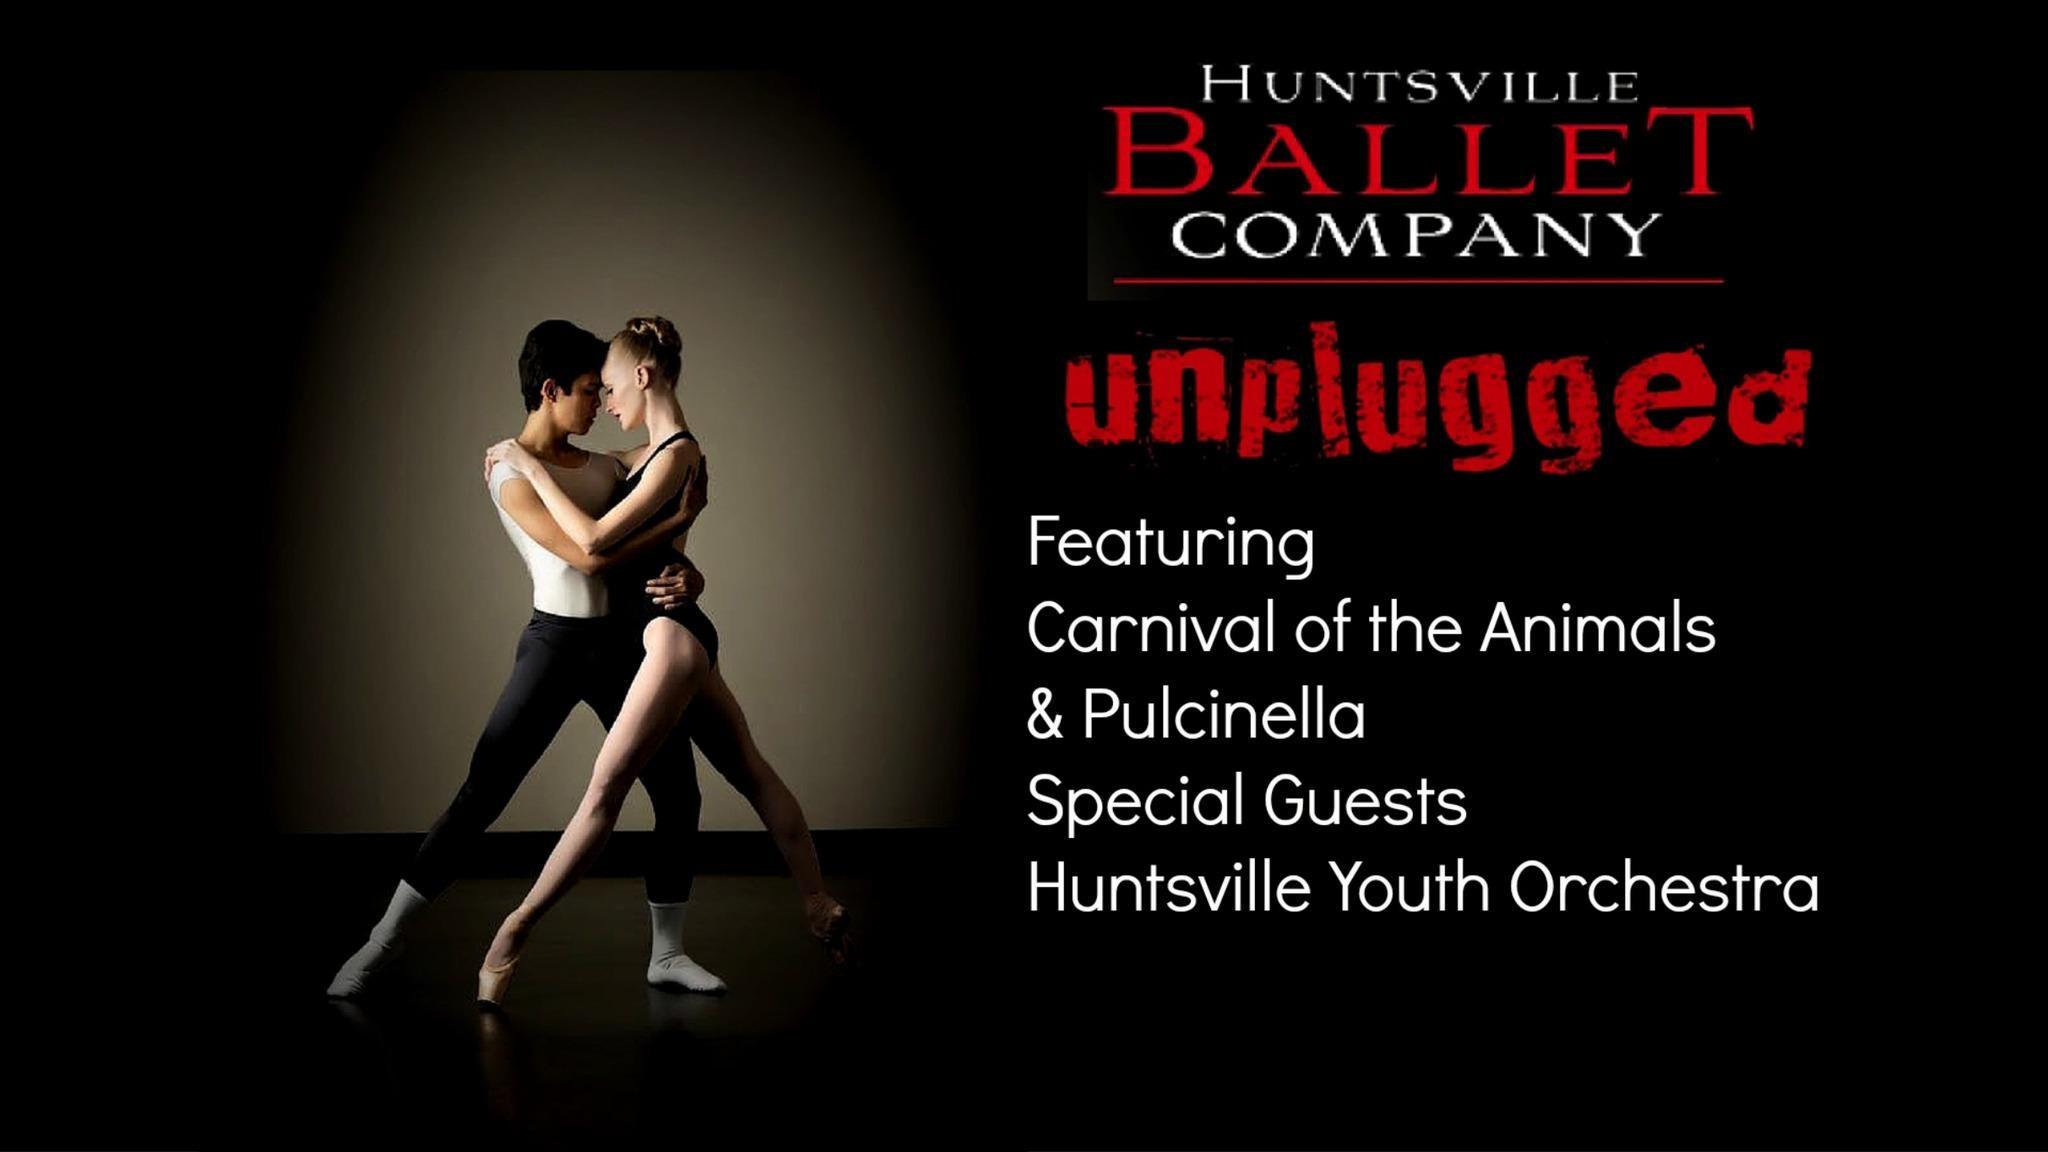 Huntsville Ballet Company at Von Braun Center Concert Hall - Huntsville, AL 35801